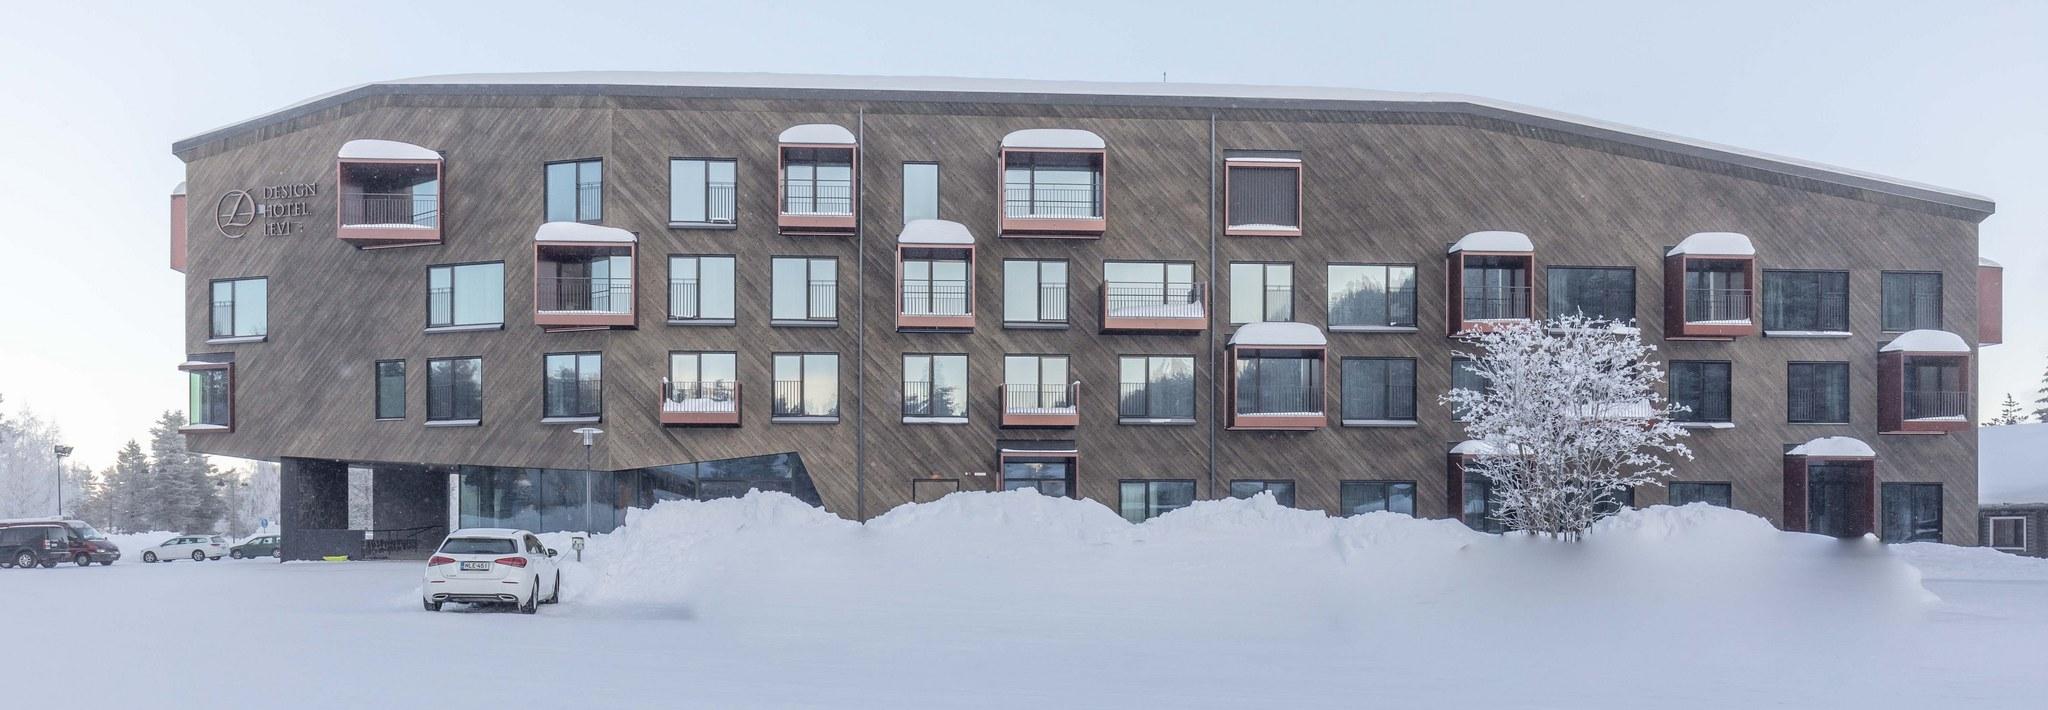 Design Hotel Levi 7 - Arno De La Chapelle